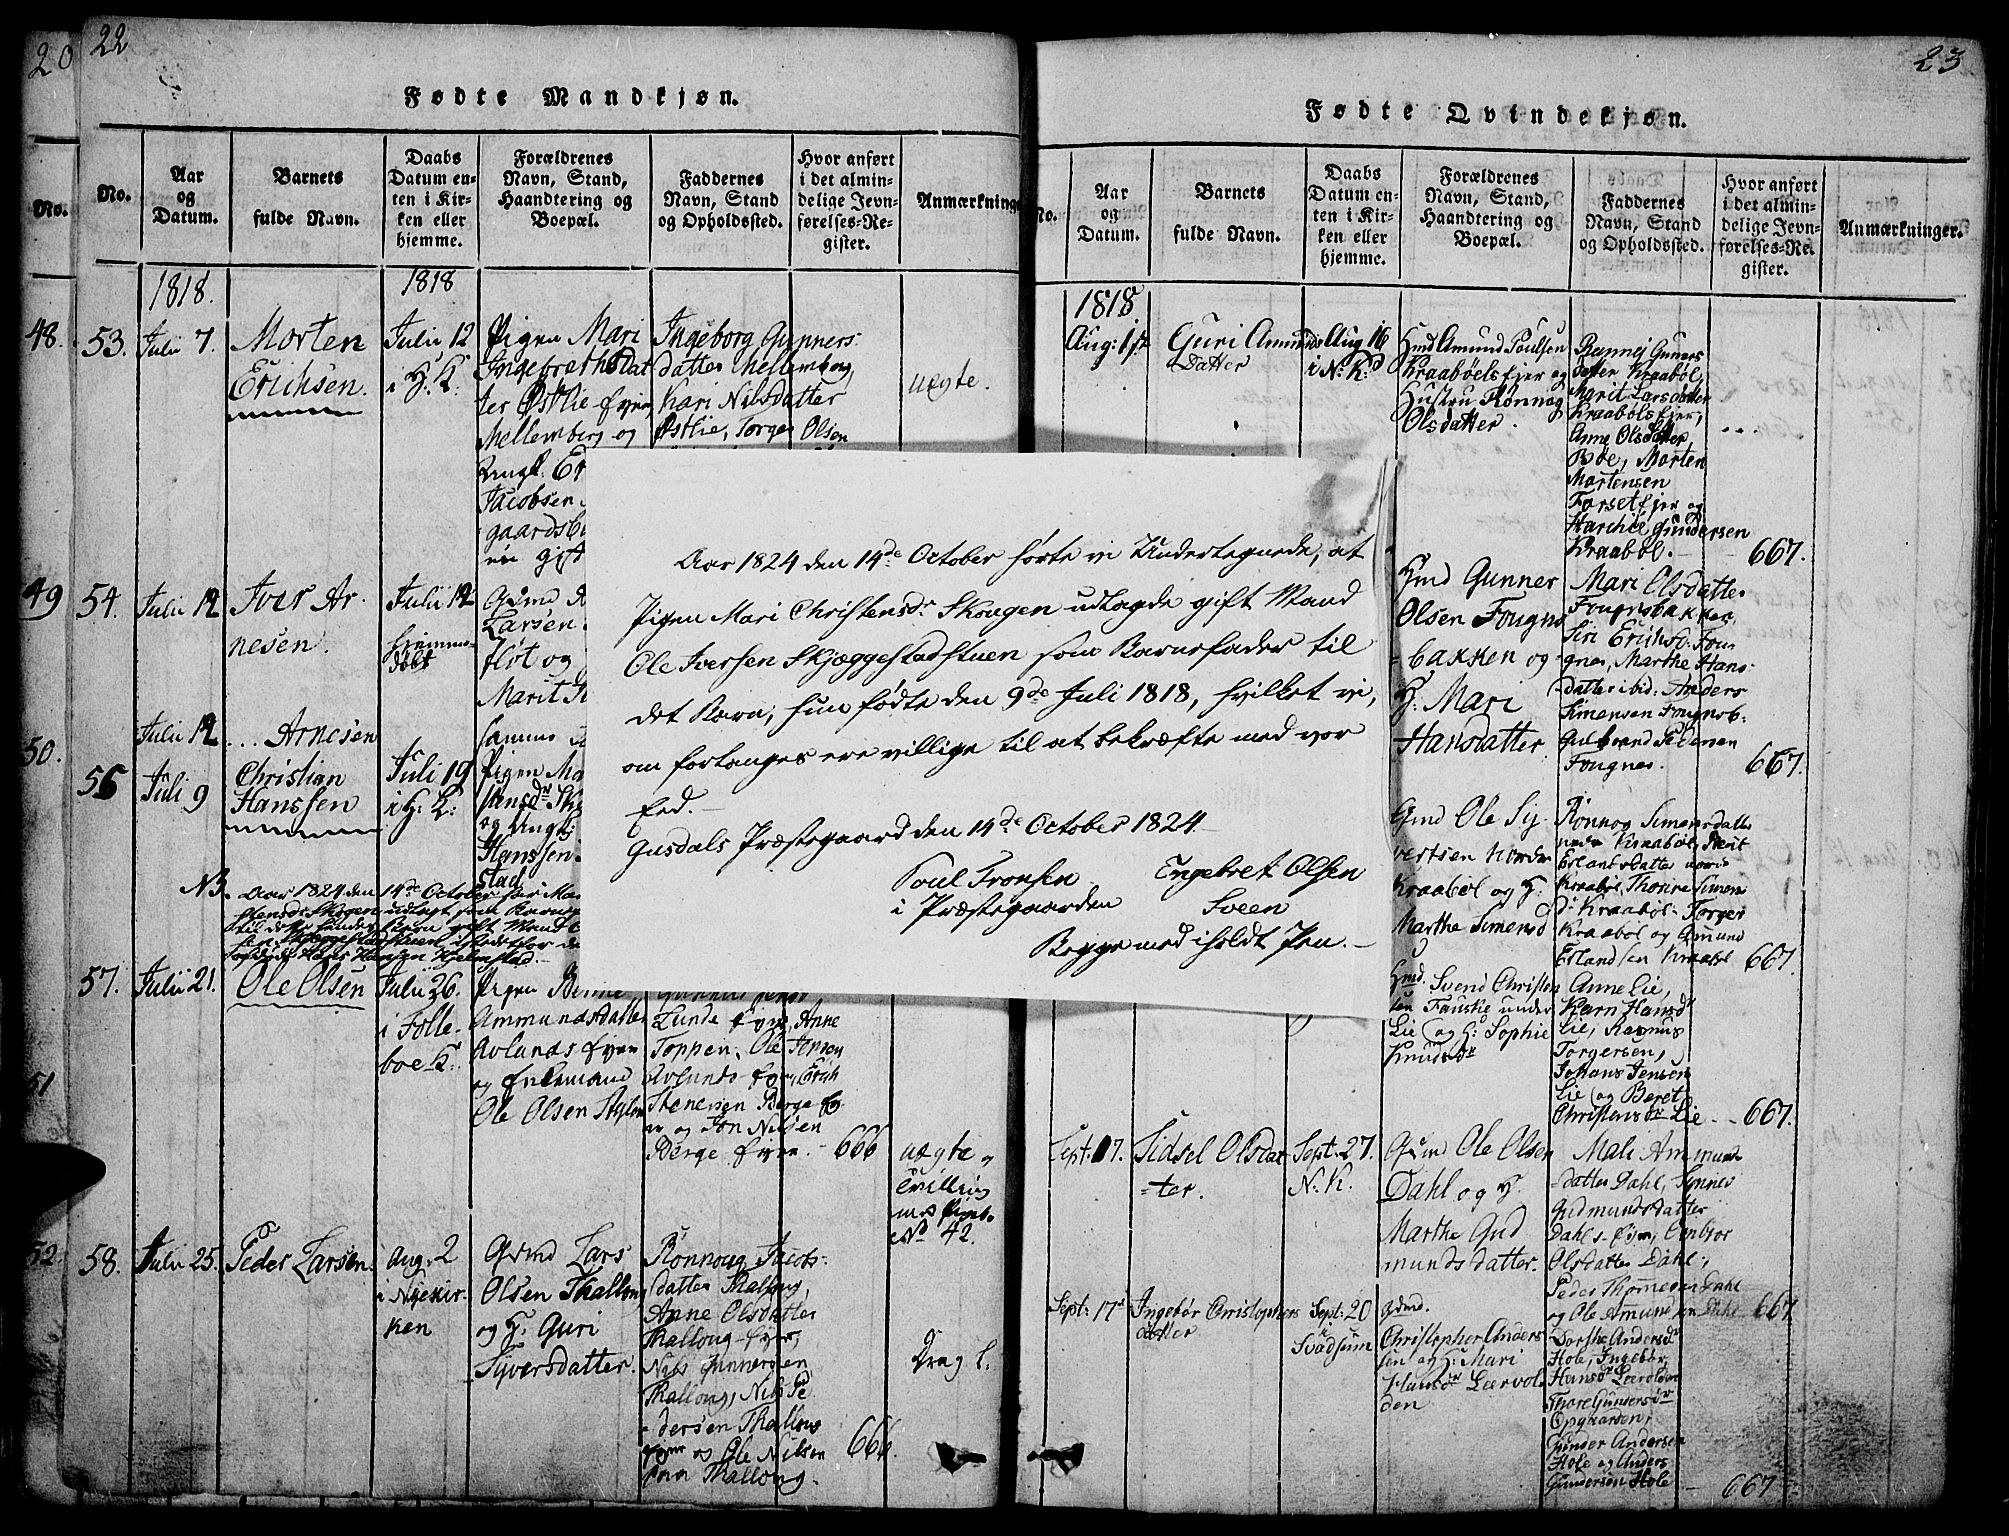 SAH, Gausdal prestekontor, Ministerialbok nr. 5, 1817-1829, s. 22-23